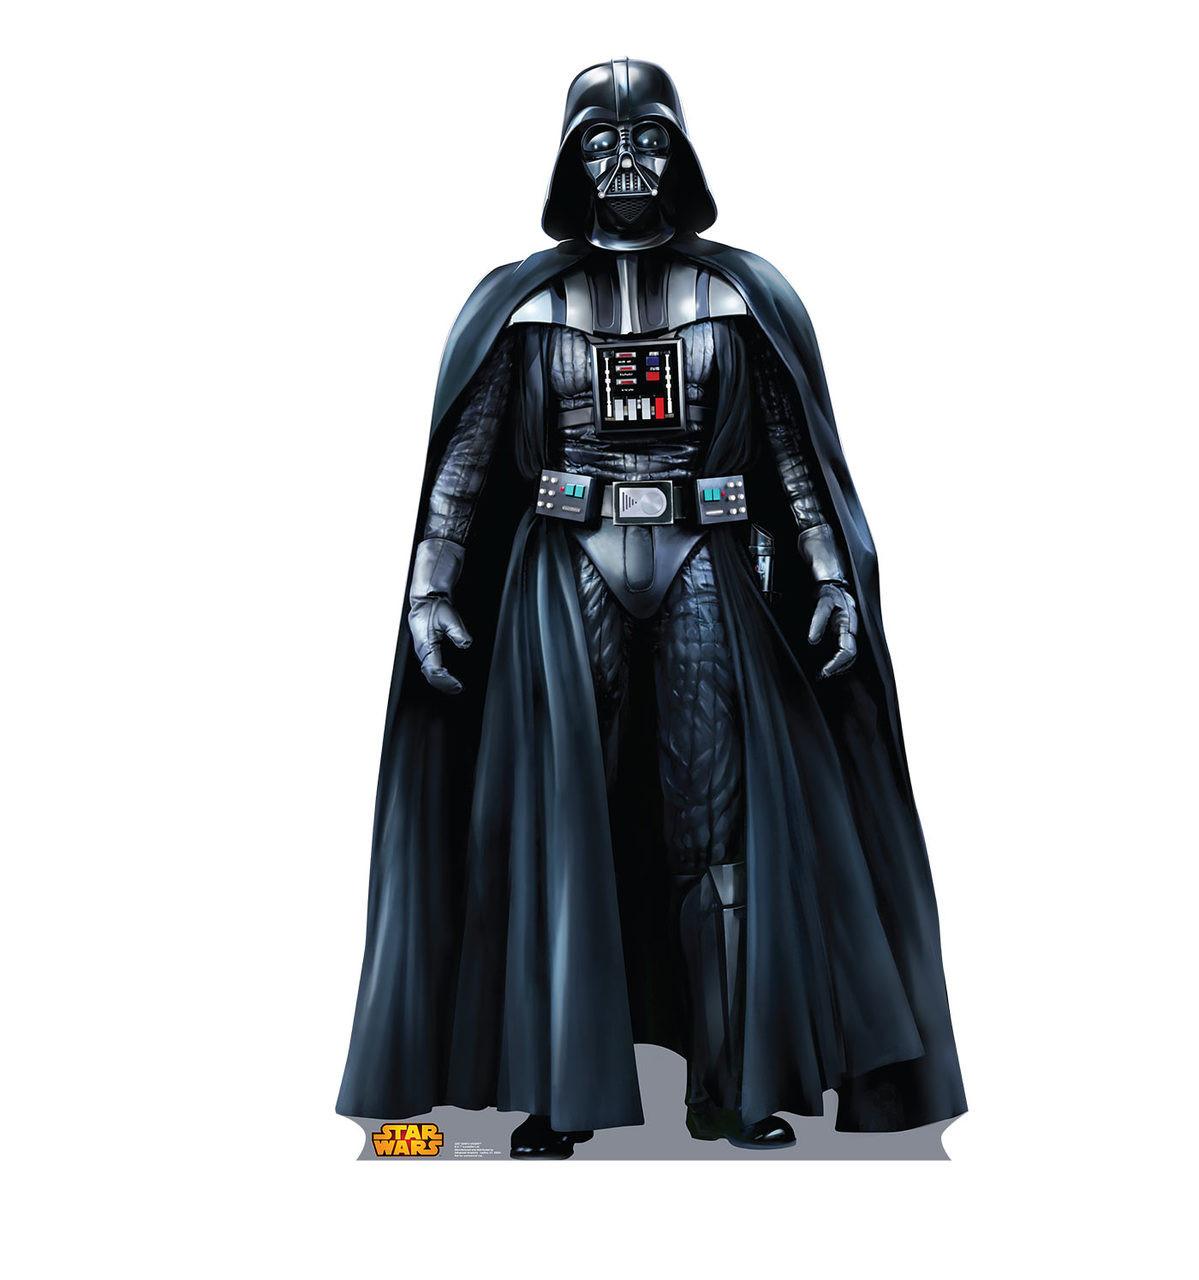 Darth Vader 2 - Star Wars - Cardboard Cutout 2037